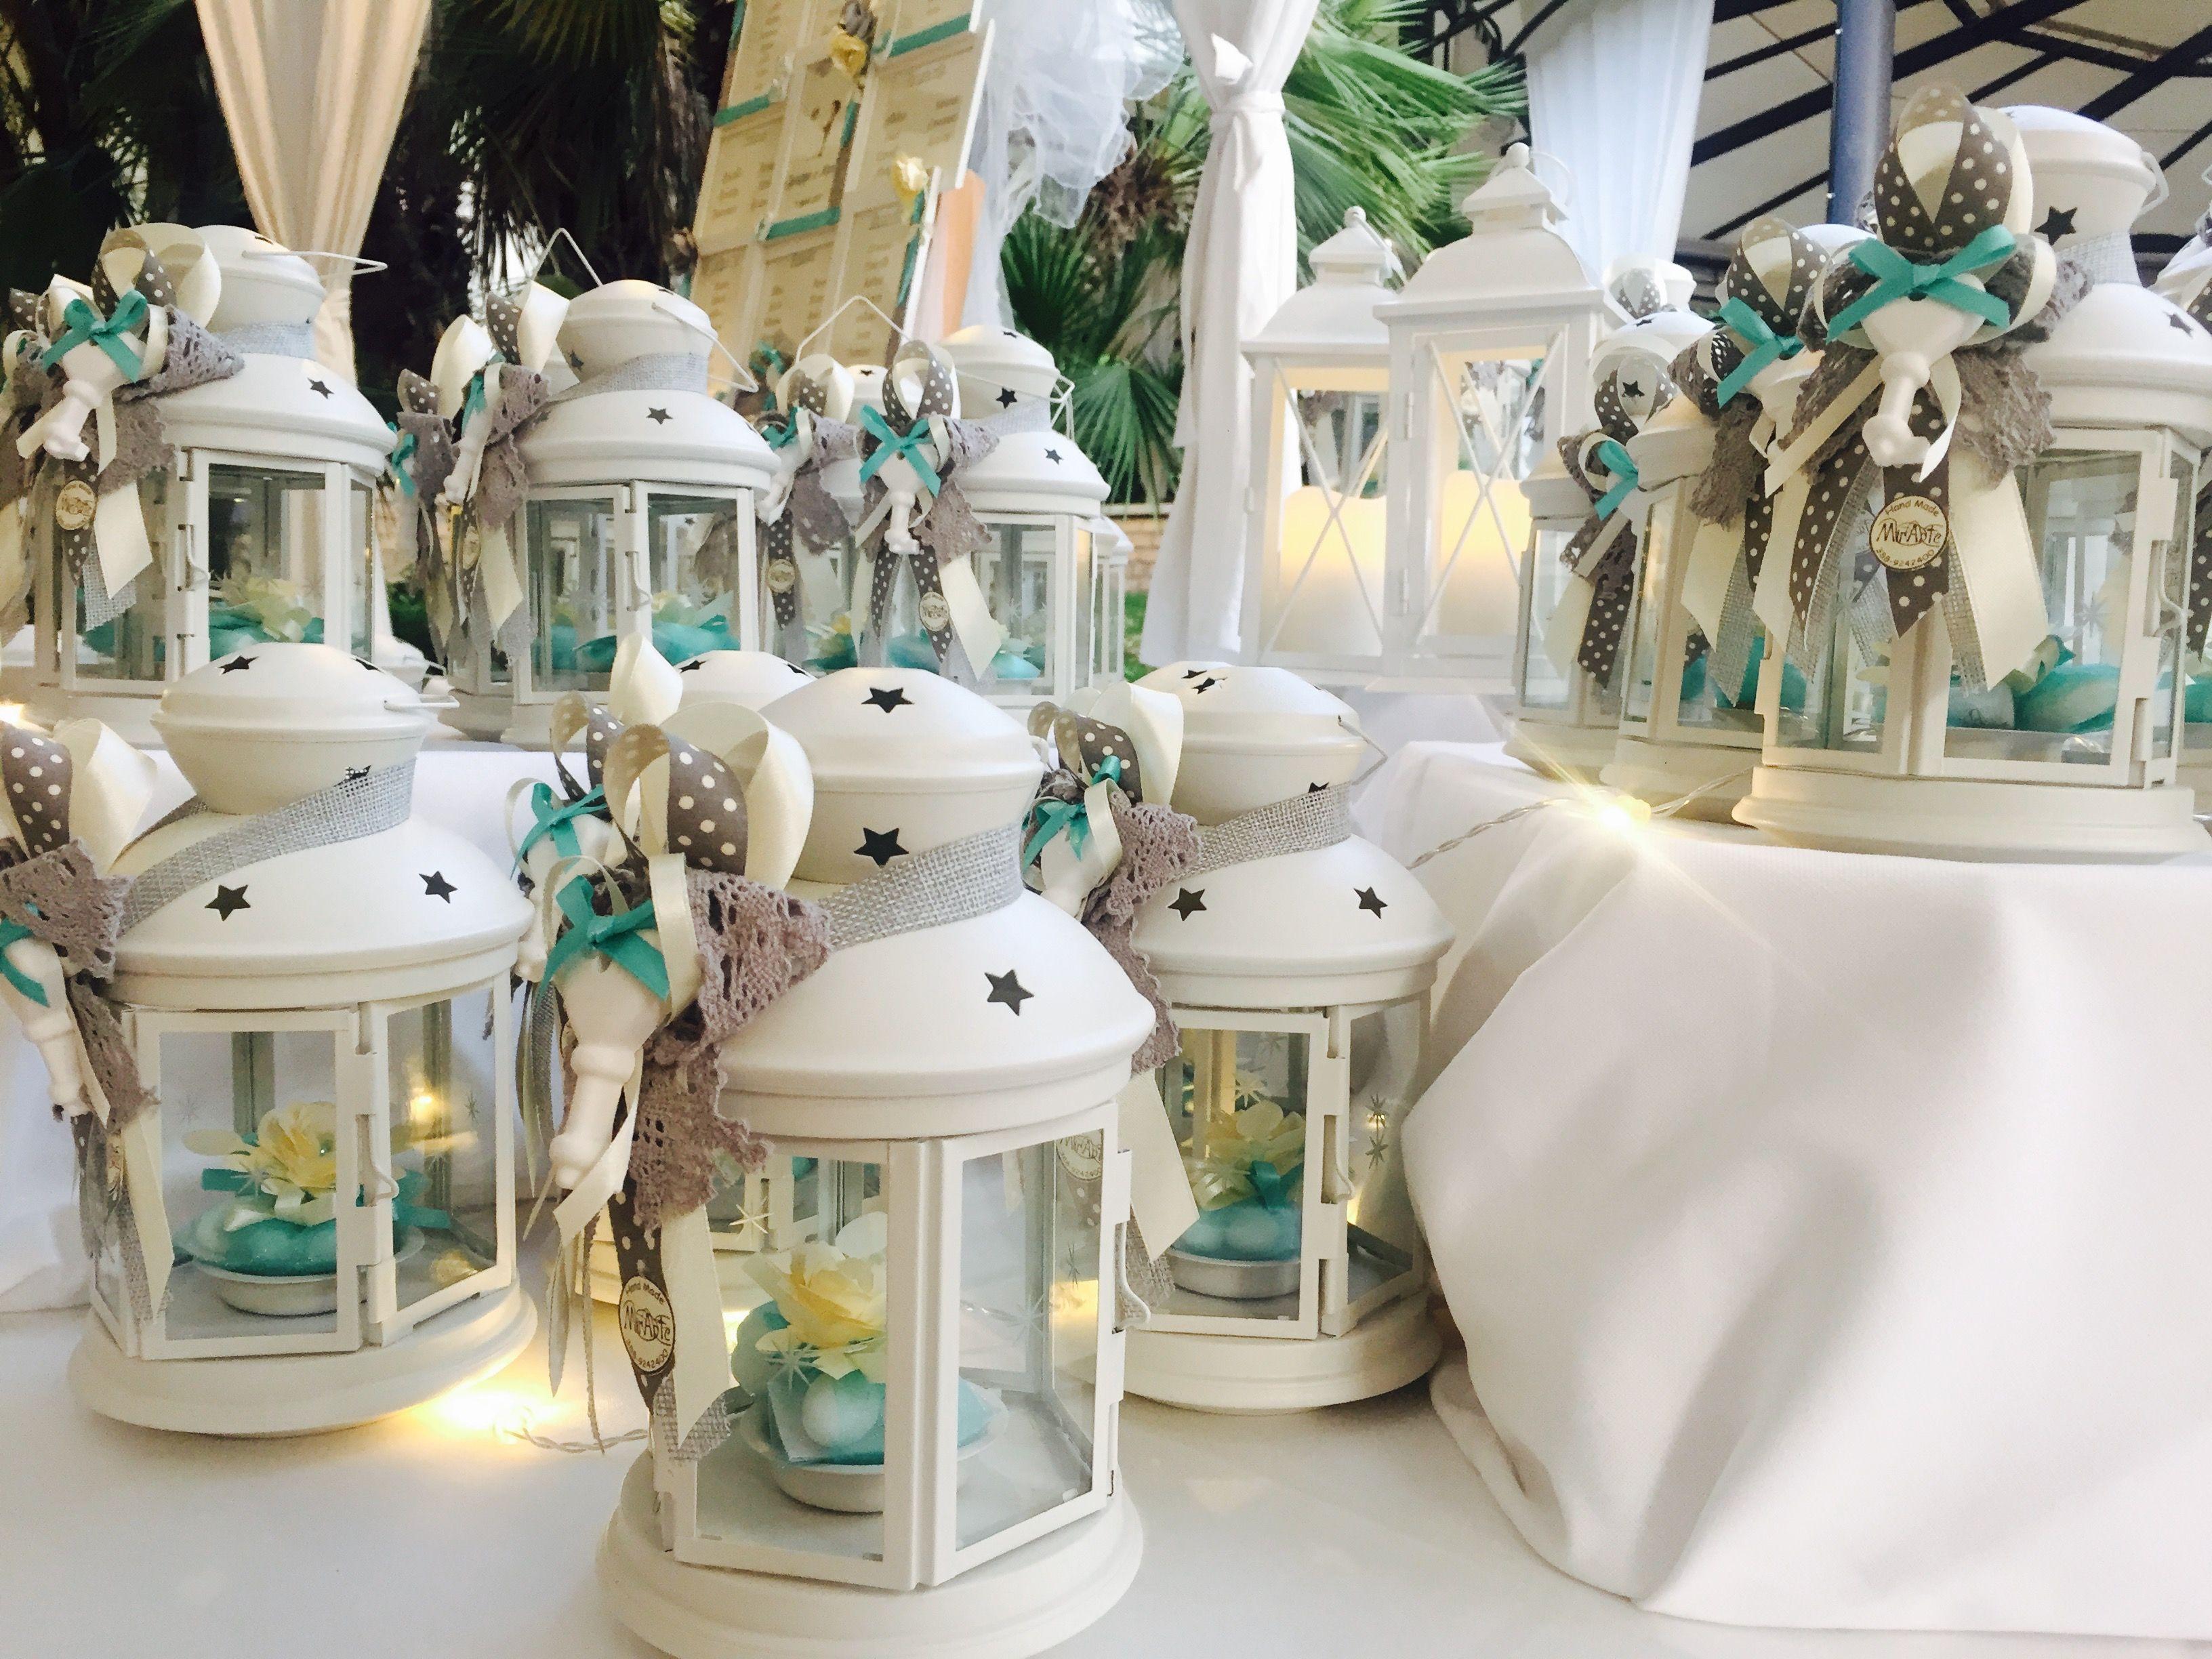 Segnaposto Natalizi Ikea.Lanterne Ikea Bomboniera Ikea Hacks Matrimonio Tiffany